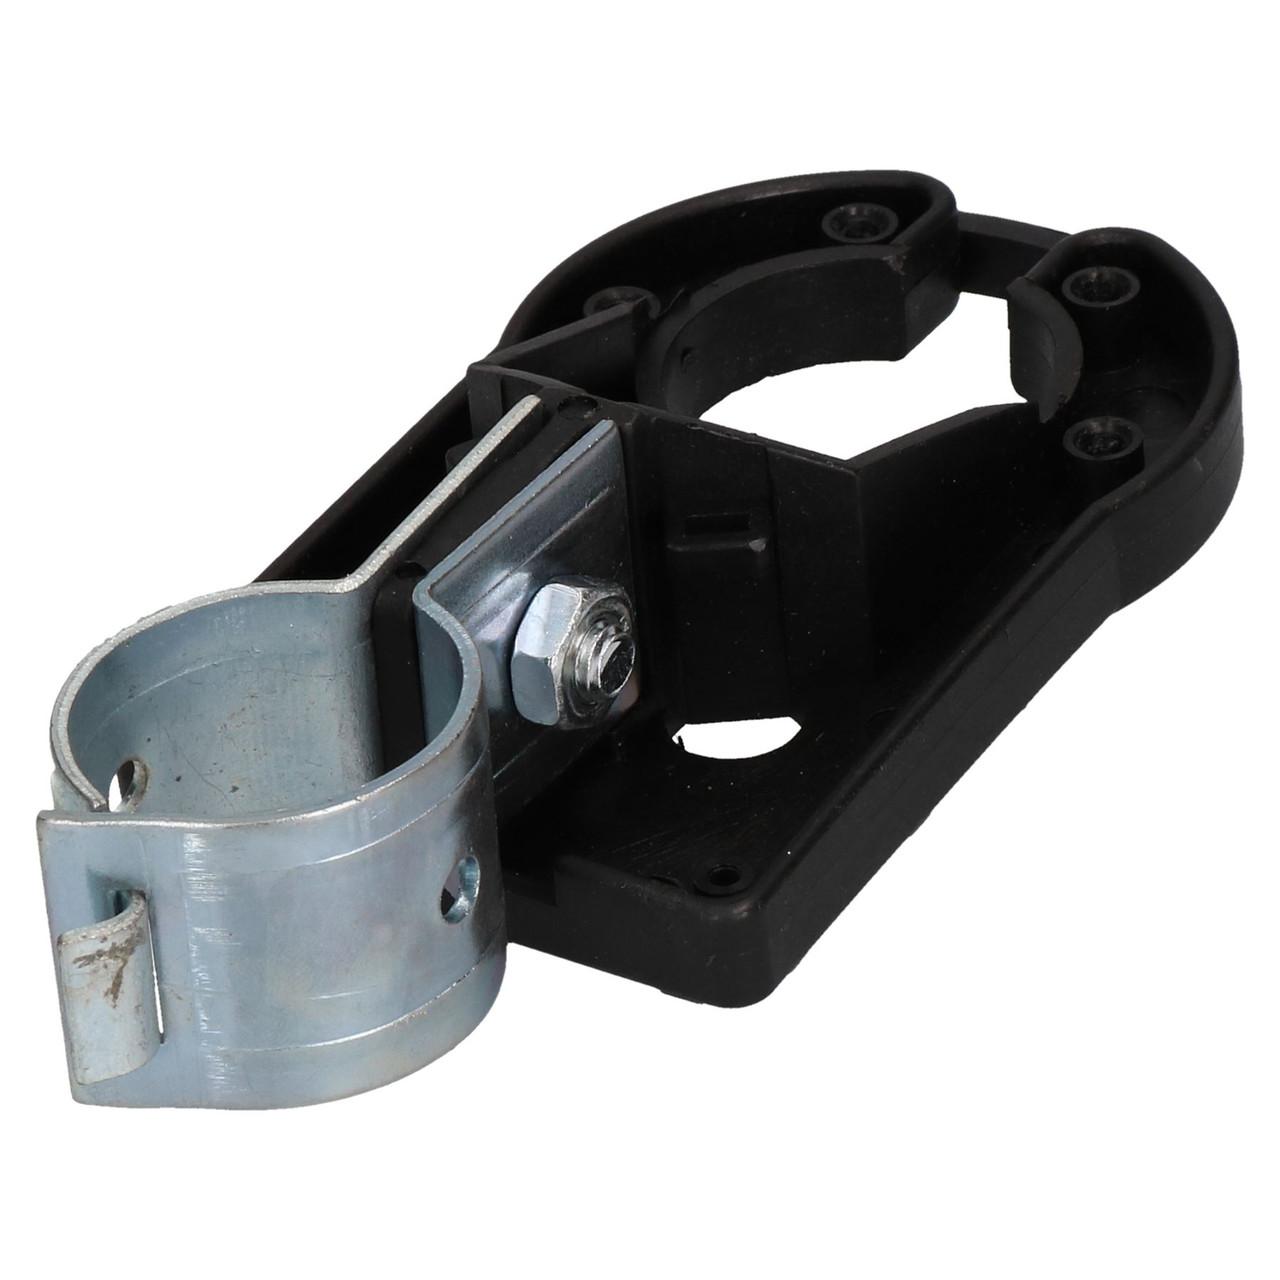 AB Tools Swan Neck Towbar Socket Mounting Plate Towing Electrics Trailer Light Caravan